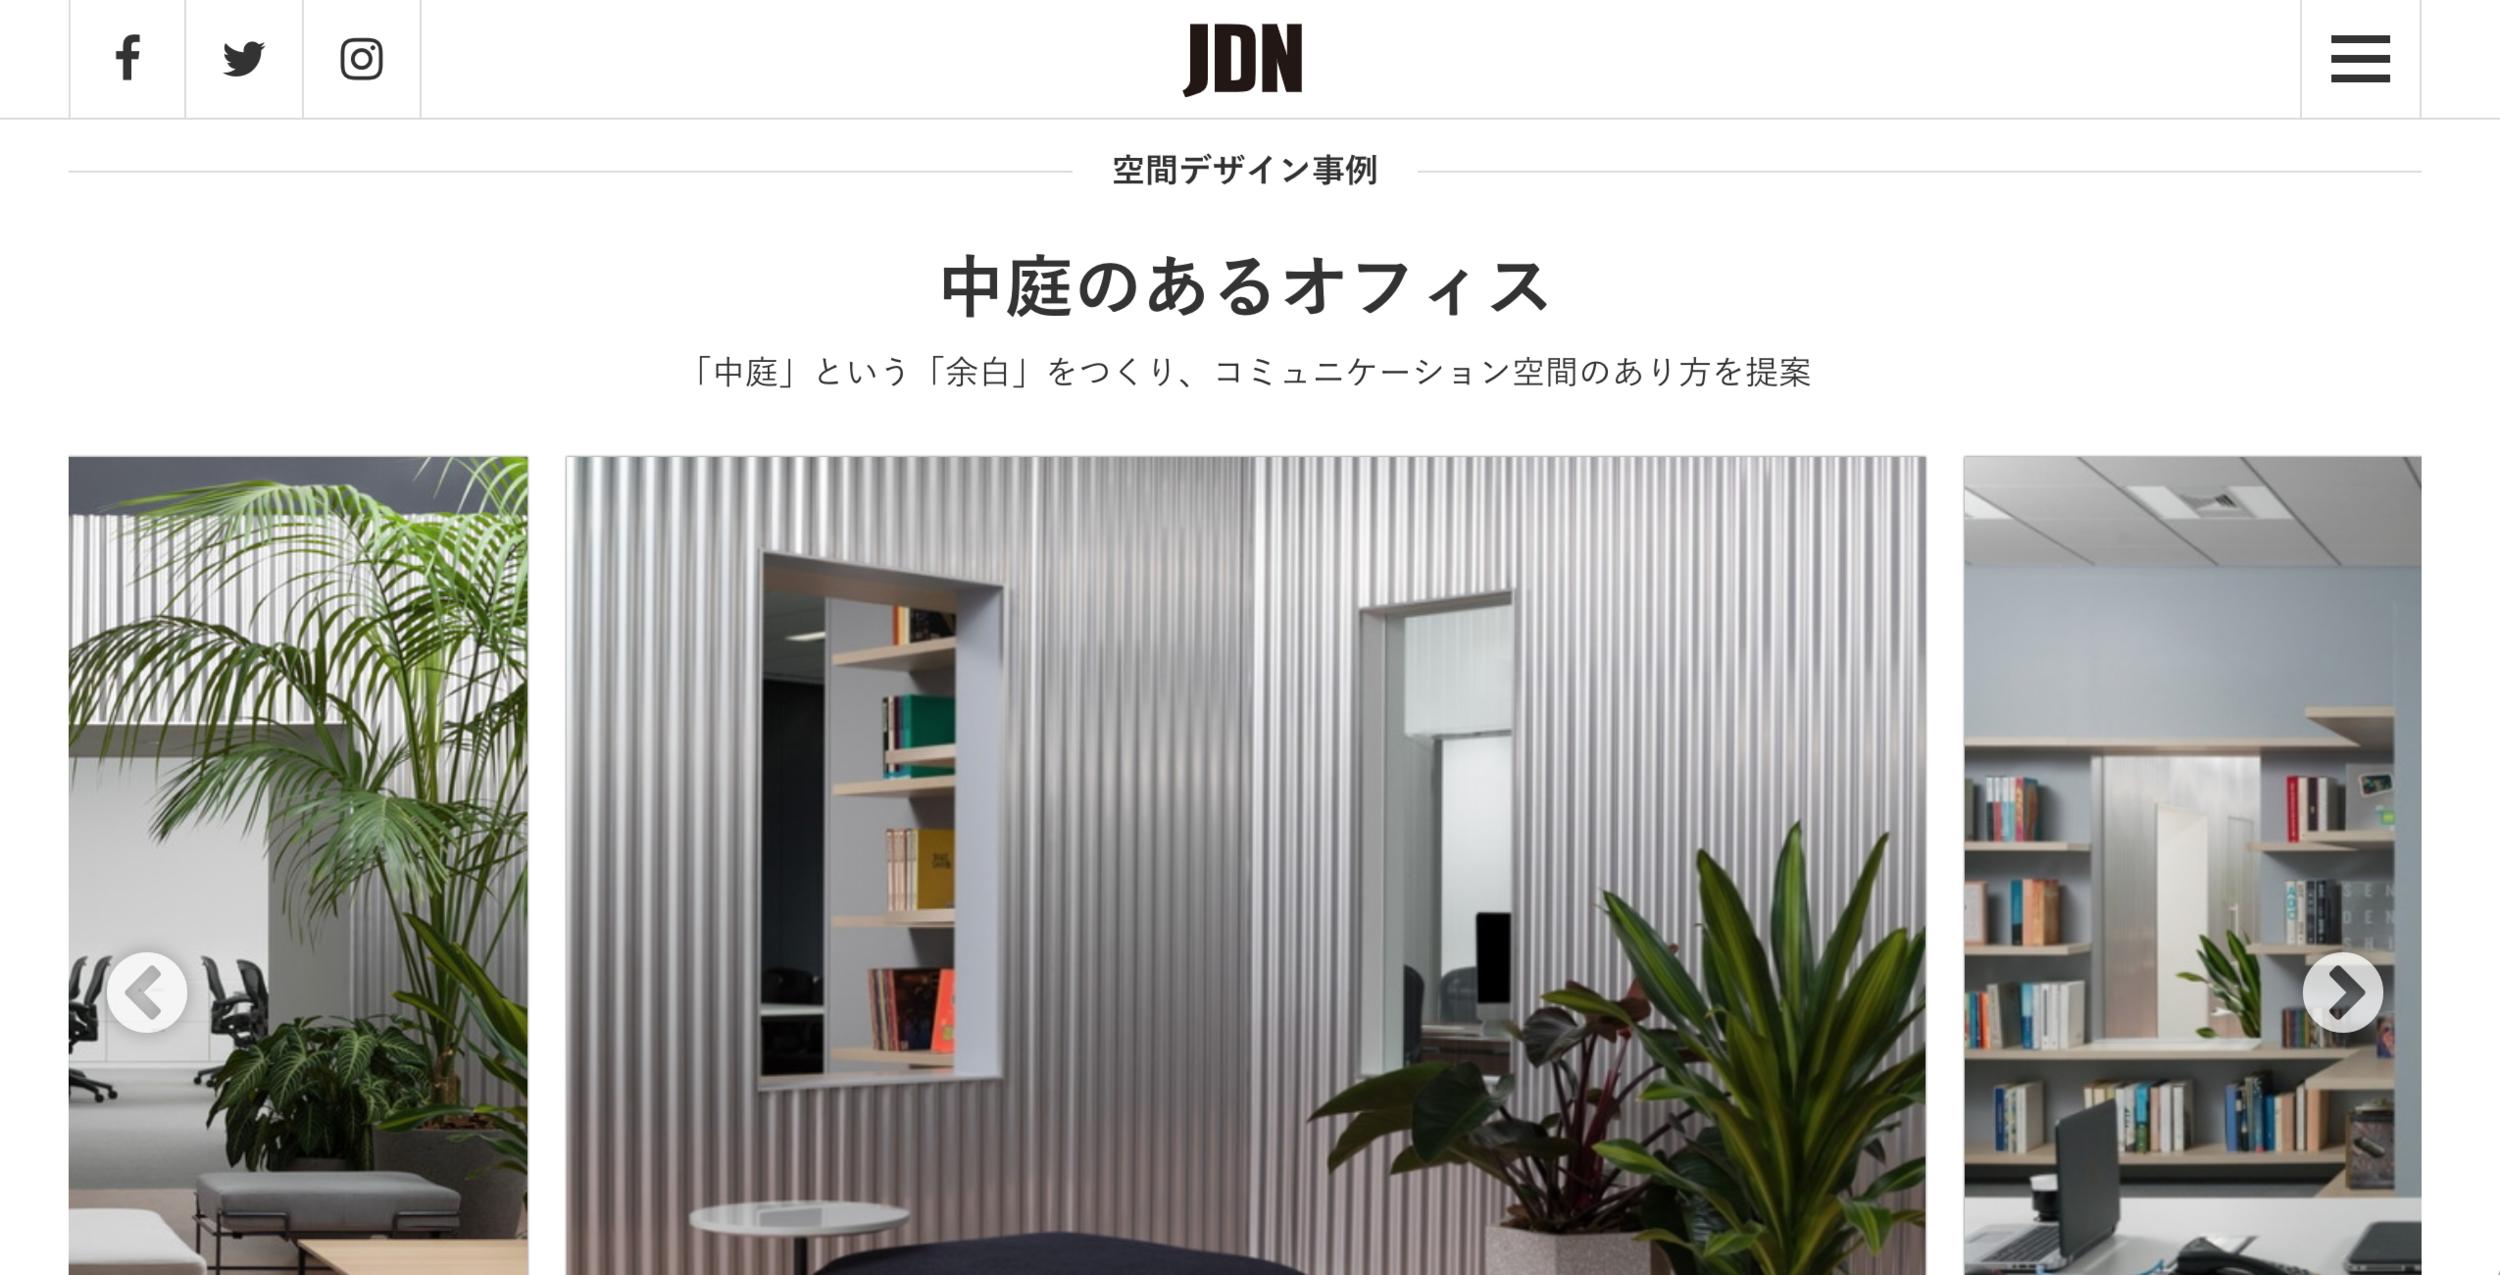 JDN 2019年5月 中庭のあるオフィス | Office with a Patio